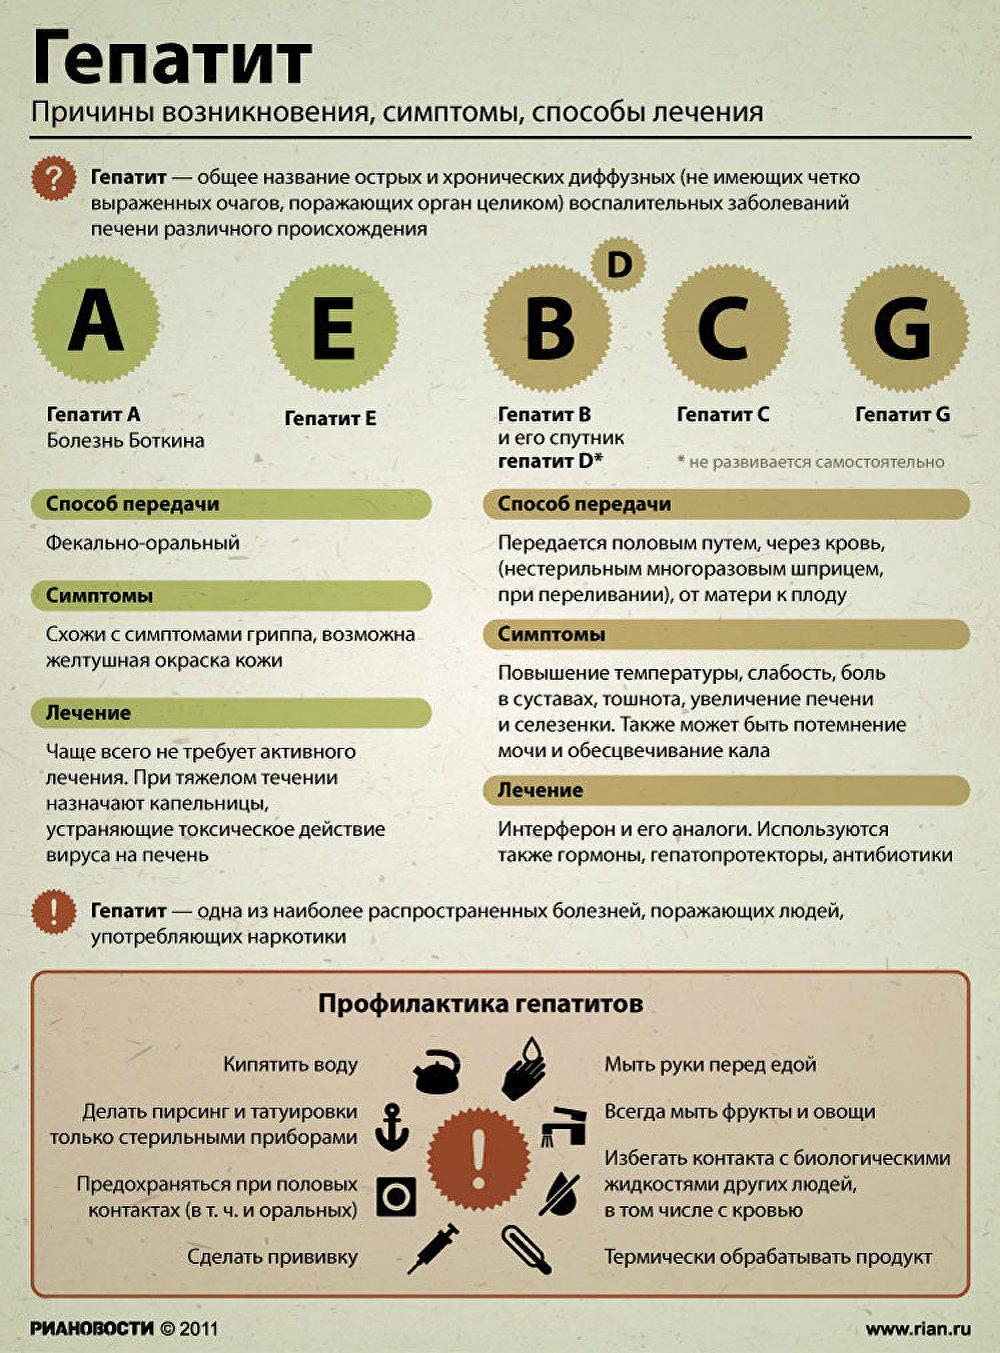 Лечение и профилактика гепатита G